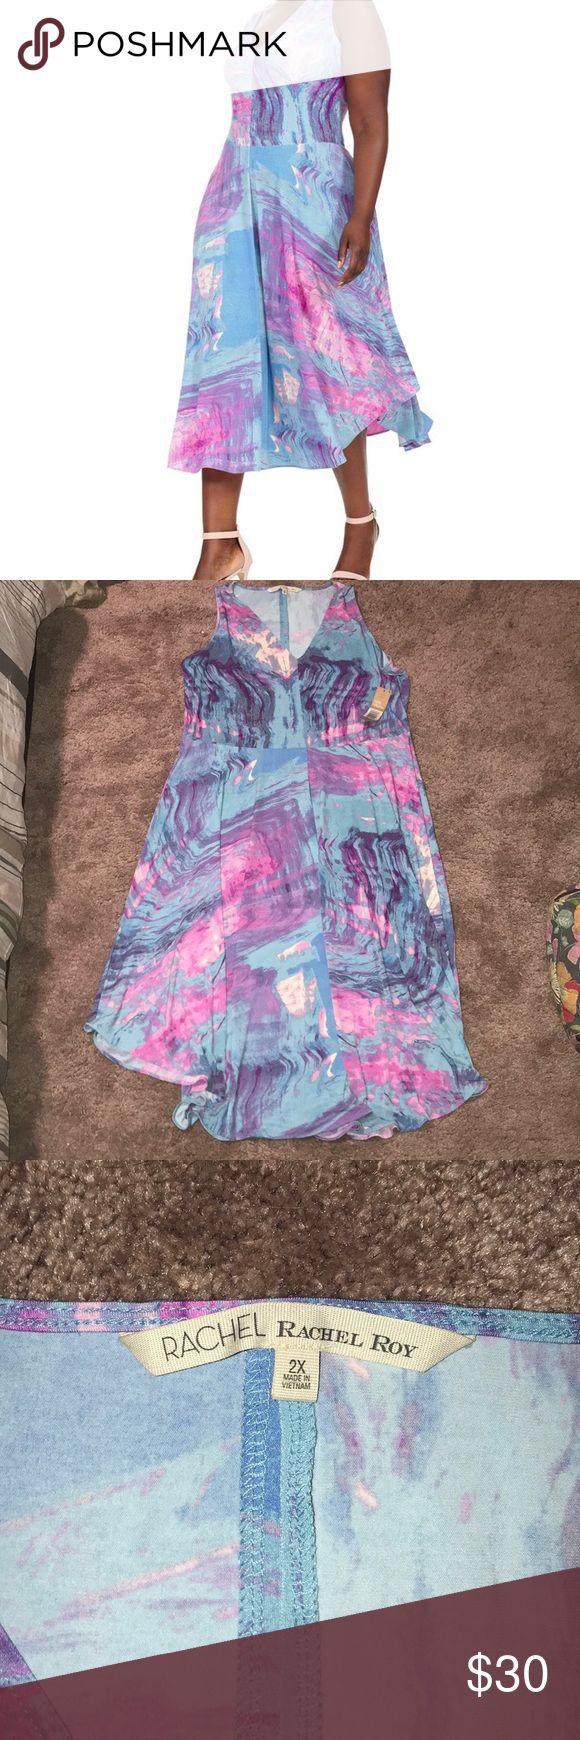 Rachel Roy Dress NWT midi length. Super spring dress. Soft material RACHEL Rachel Roy Dresses Midi